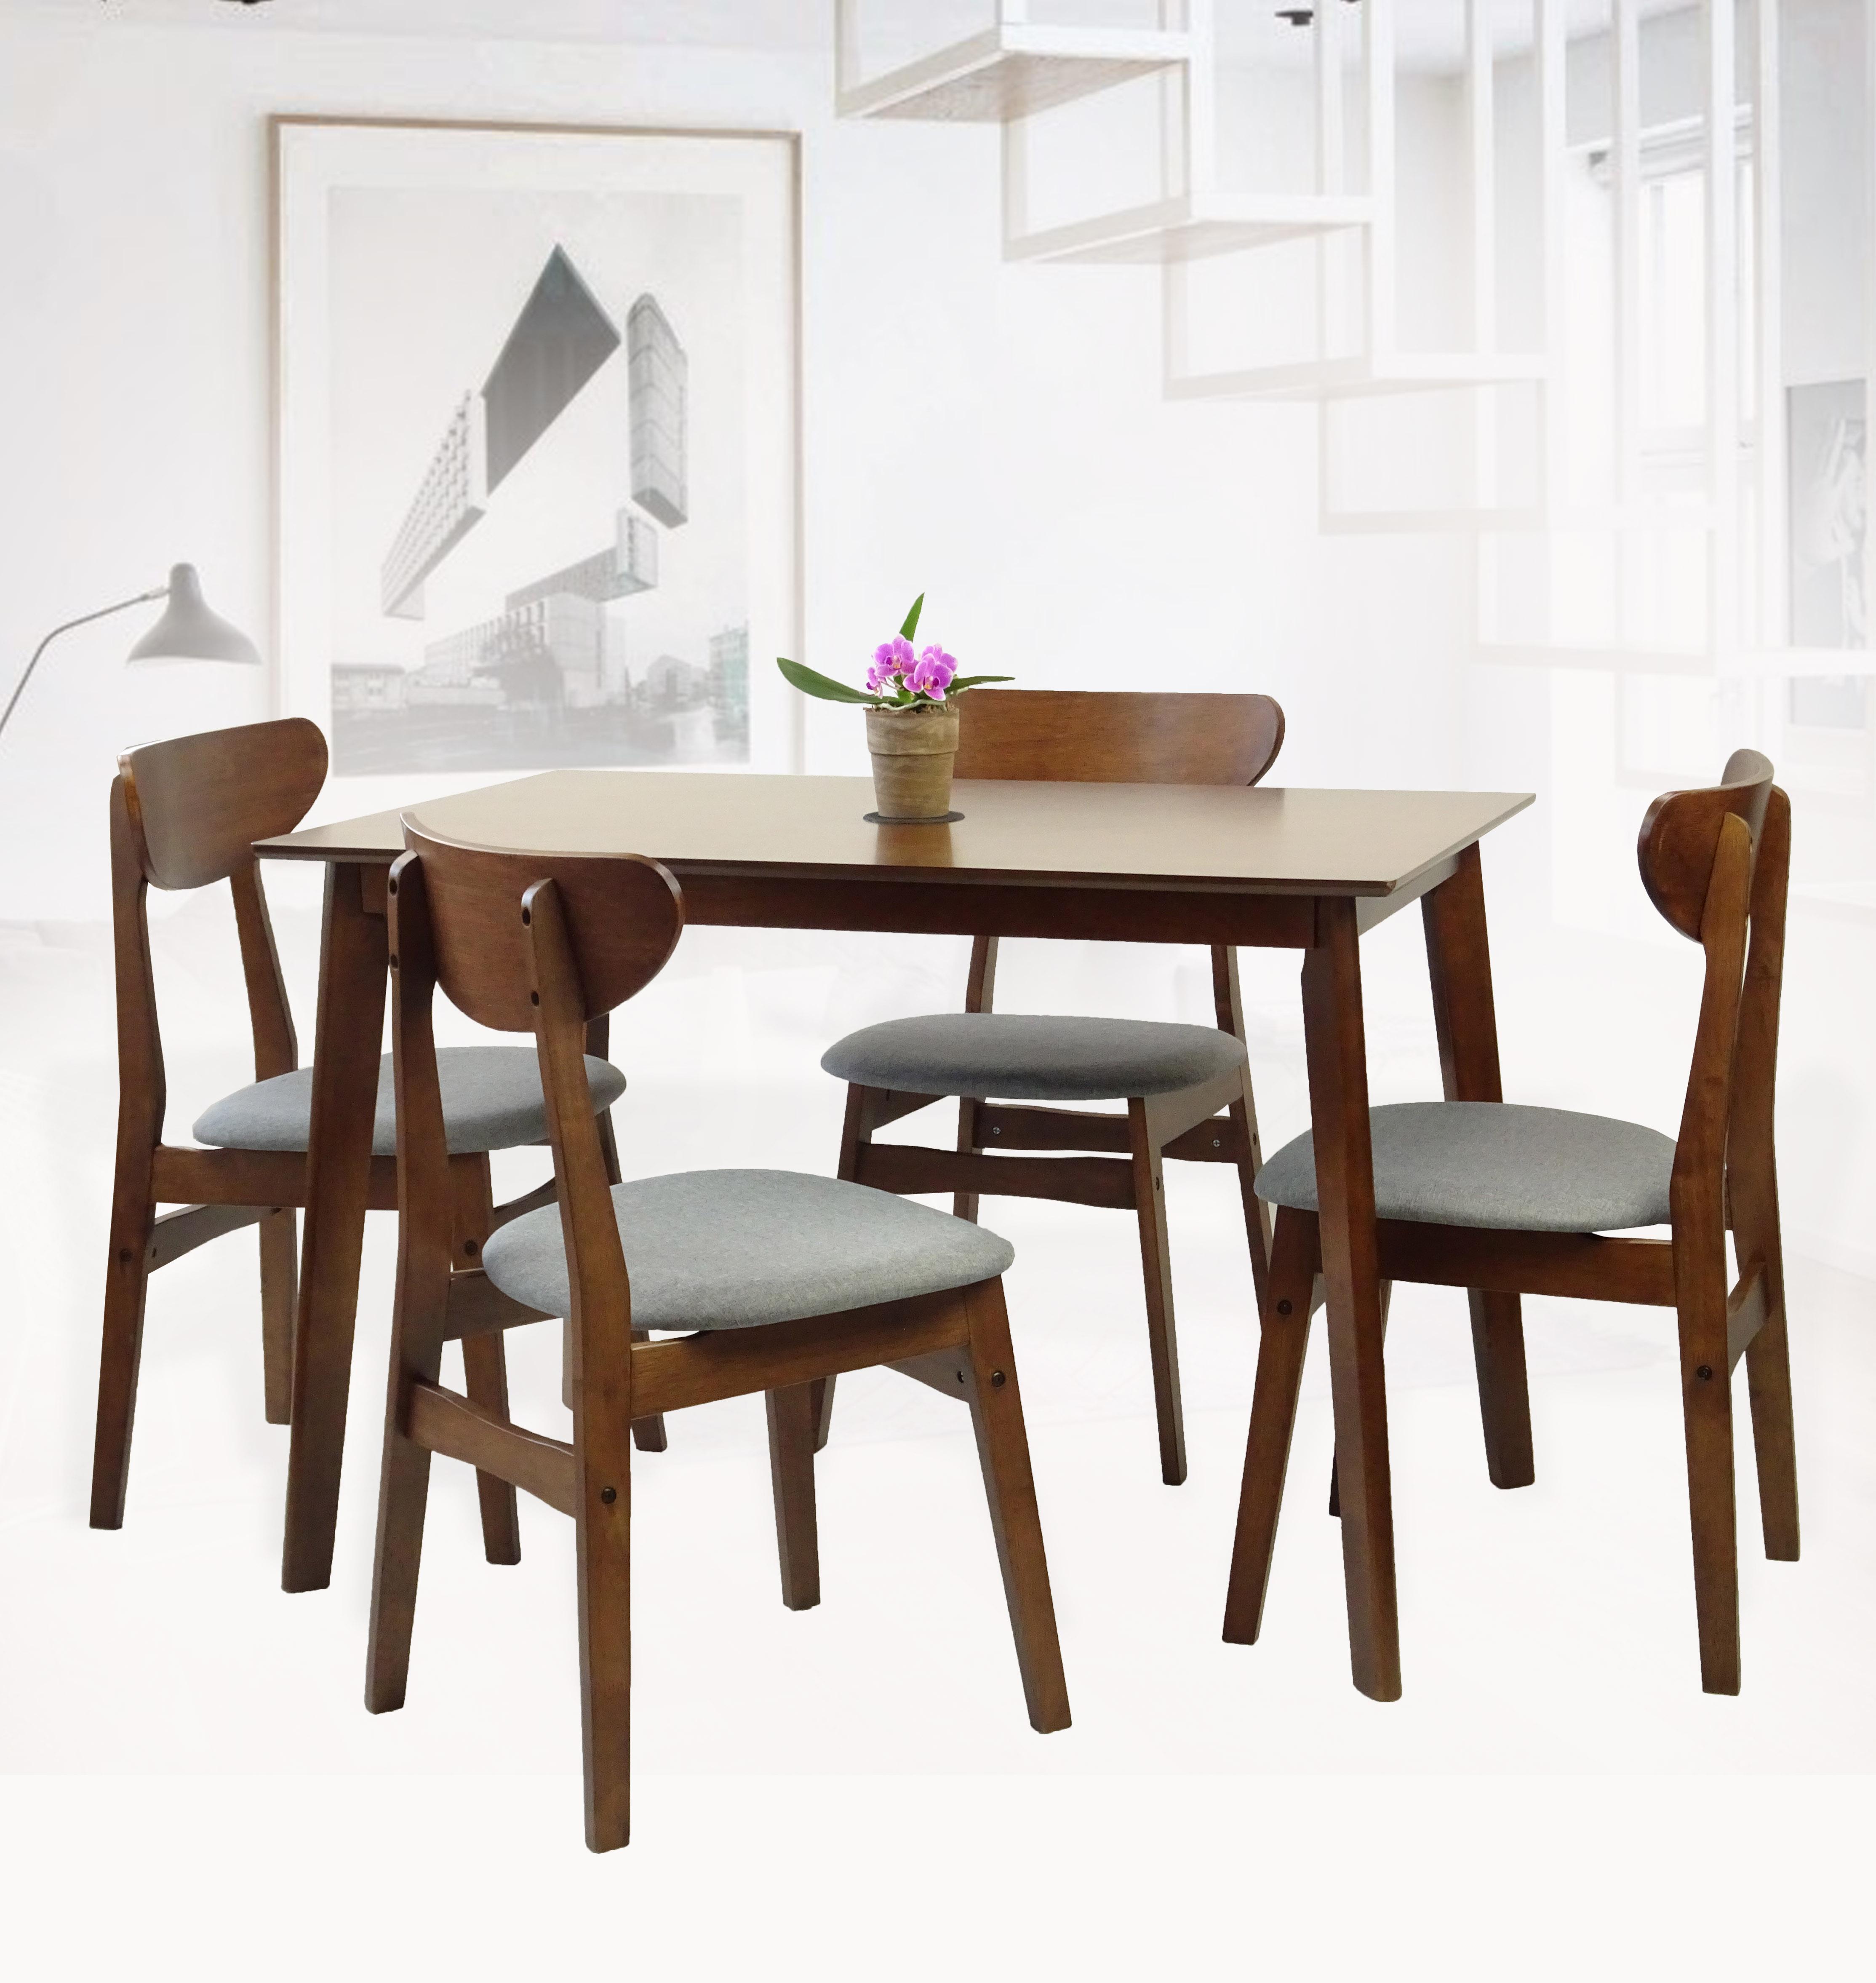 Rattan Kitchen Table: Buy Rattan Wicker Furniture Set Of 5 Dining Kitchen